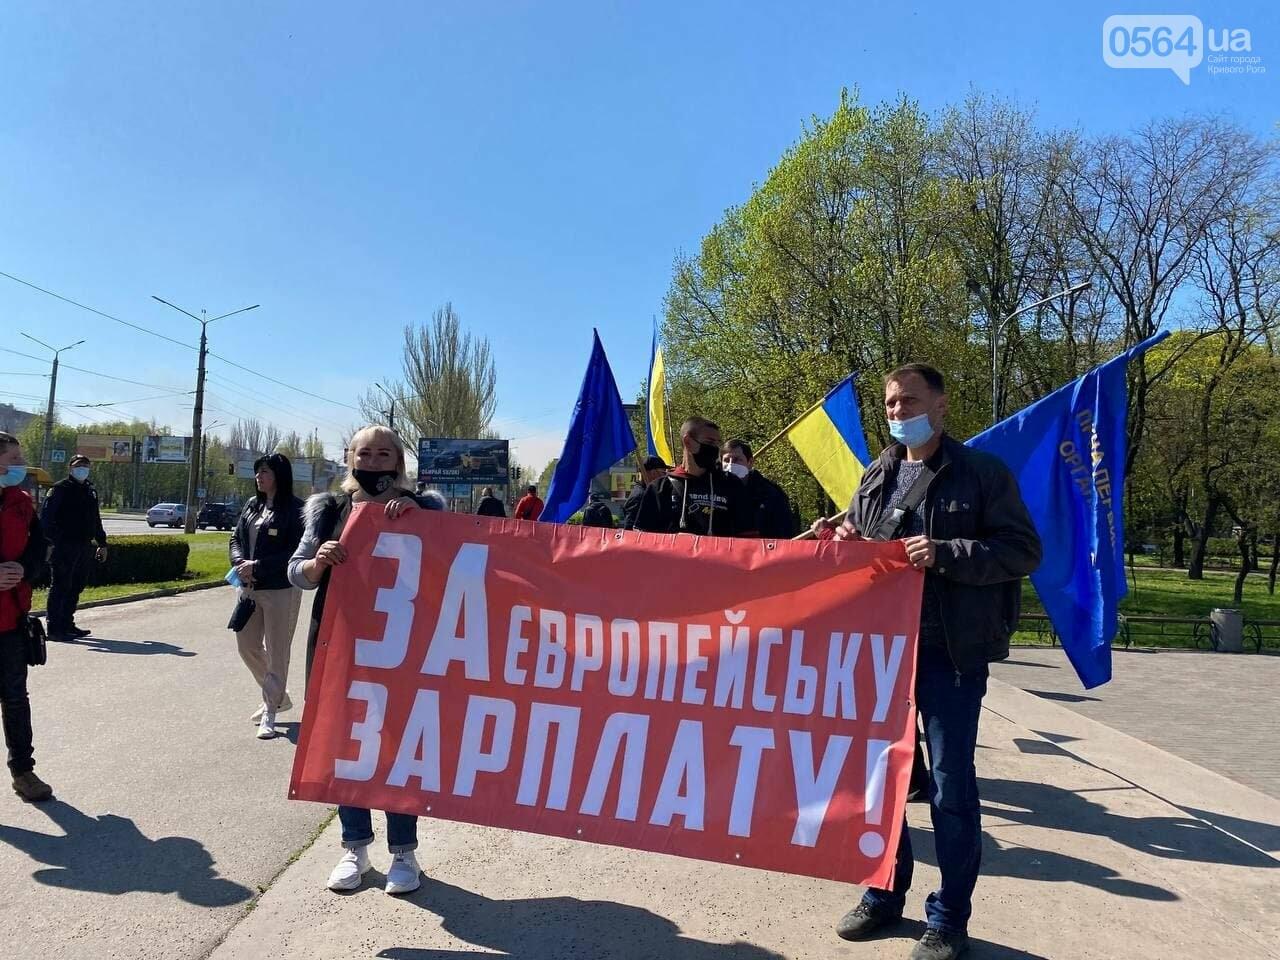 """Мир! Труд! Май!"", ""Зарплату 1000 евро!"", - криворожане вышли на первомайский марш, - ФОТО, ВИДЕО , фото-3"